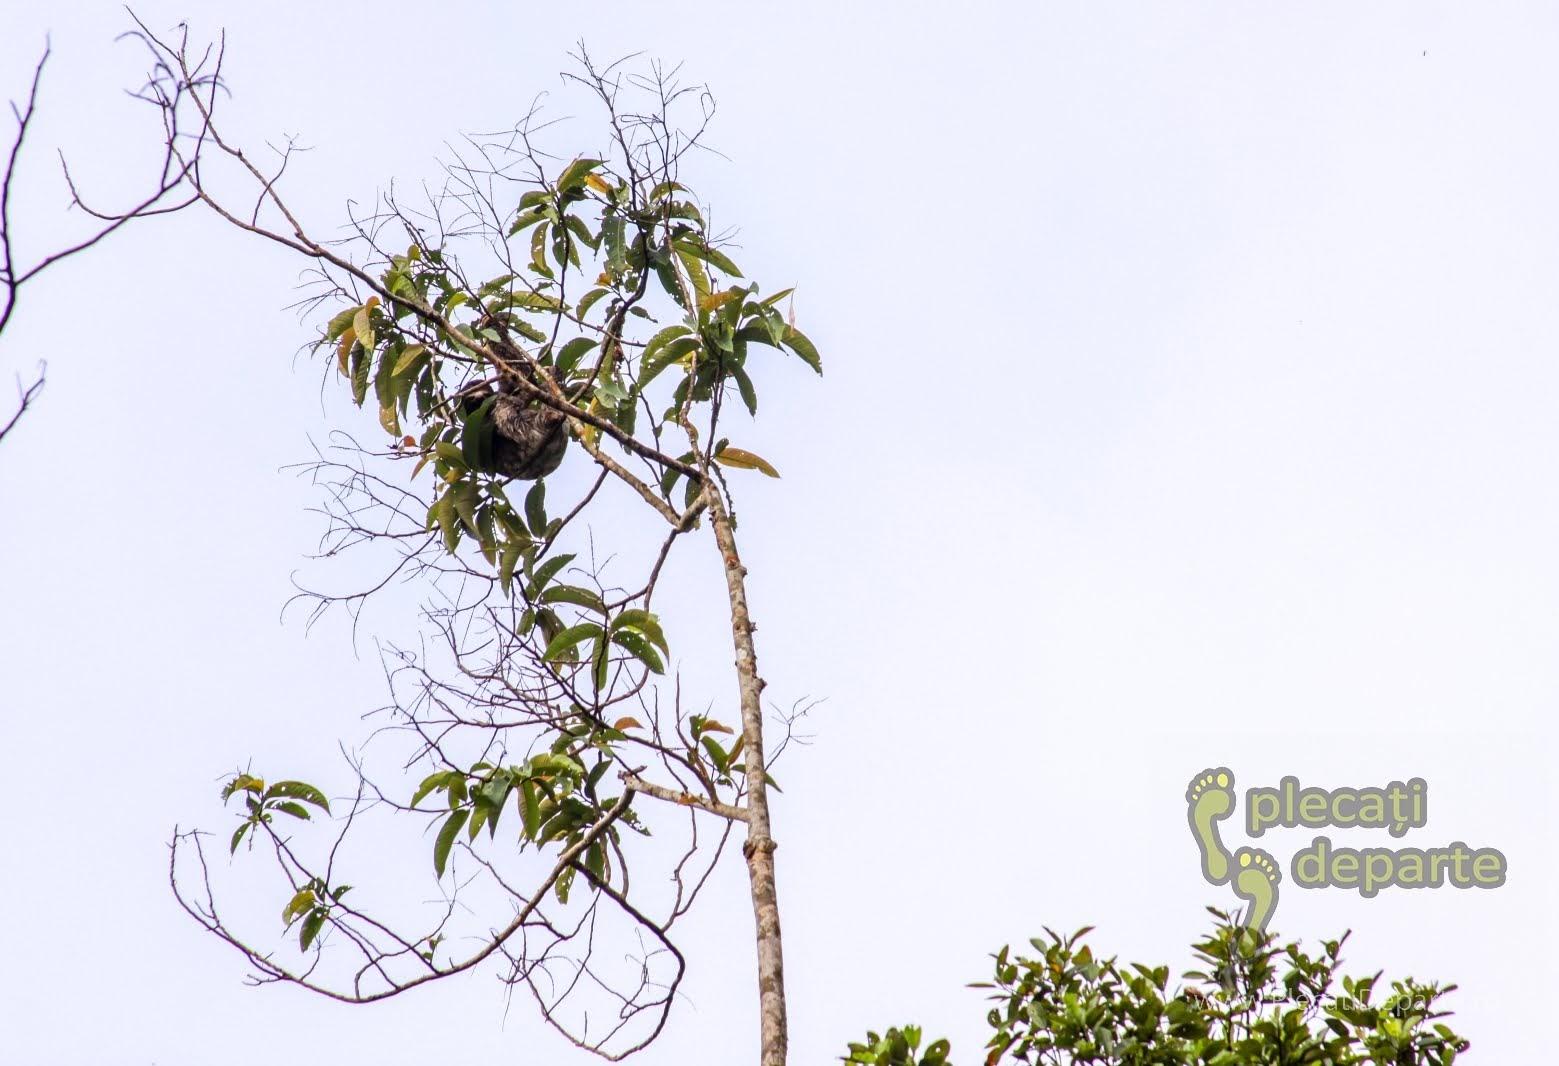 Lenesul, animal din jungla amazoniana, in Rezervatia Nationala Pacaya-Samiria, Peru